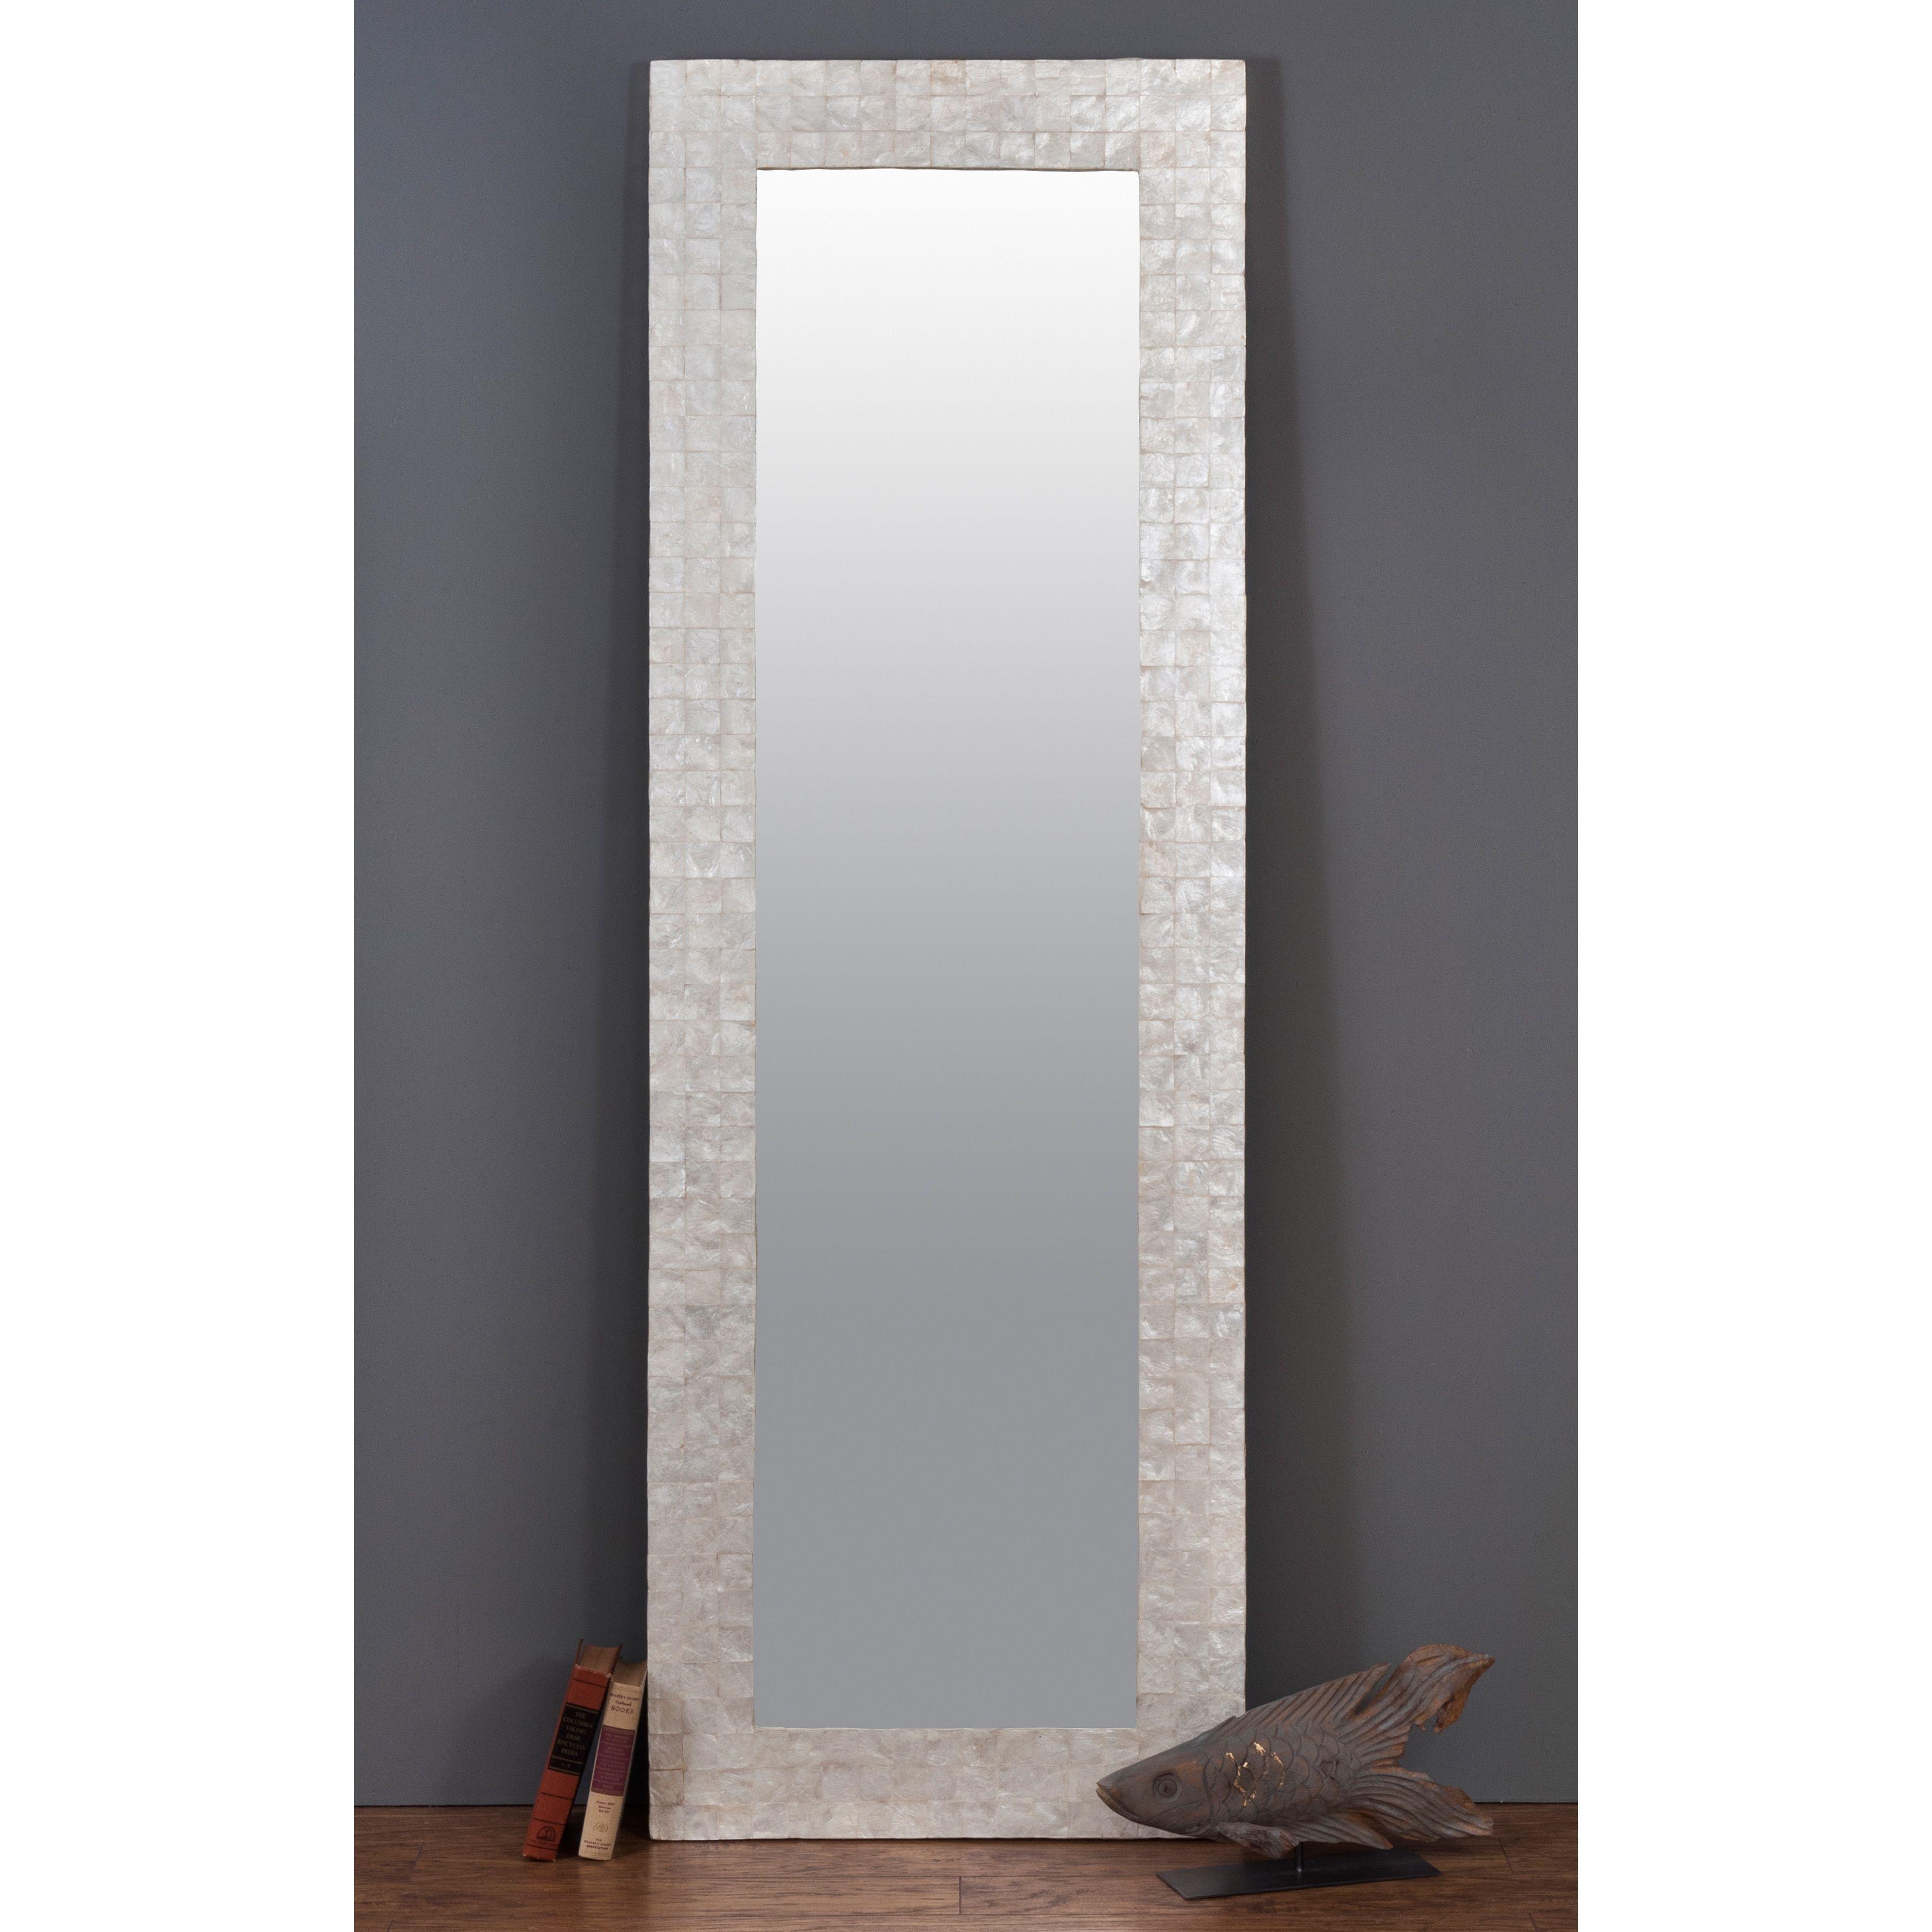 Mirror,Rectangular,Full Length Home Goods: Free Shipping on orders ...